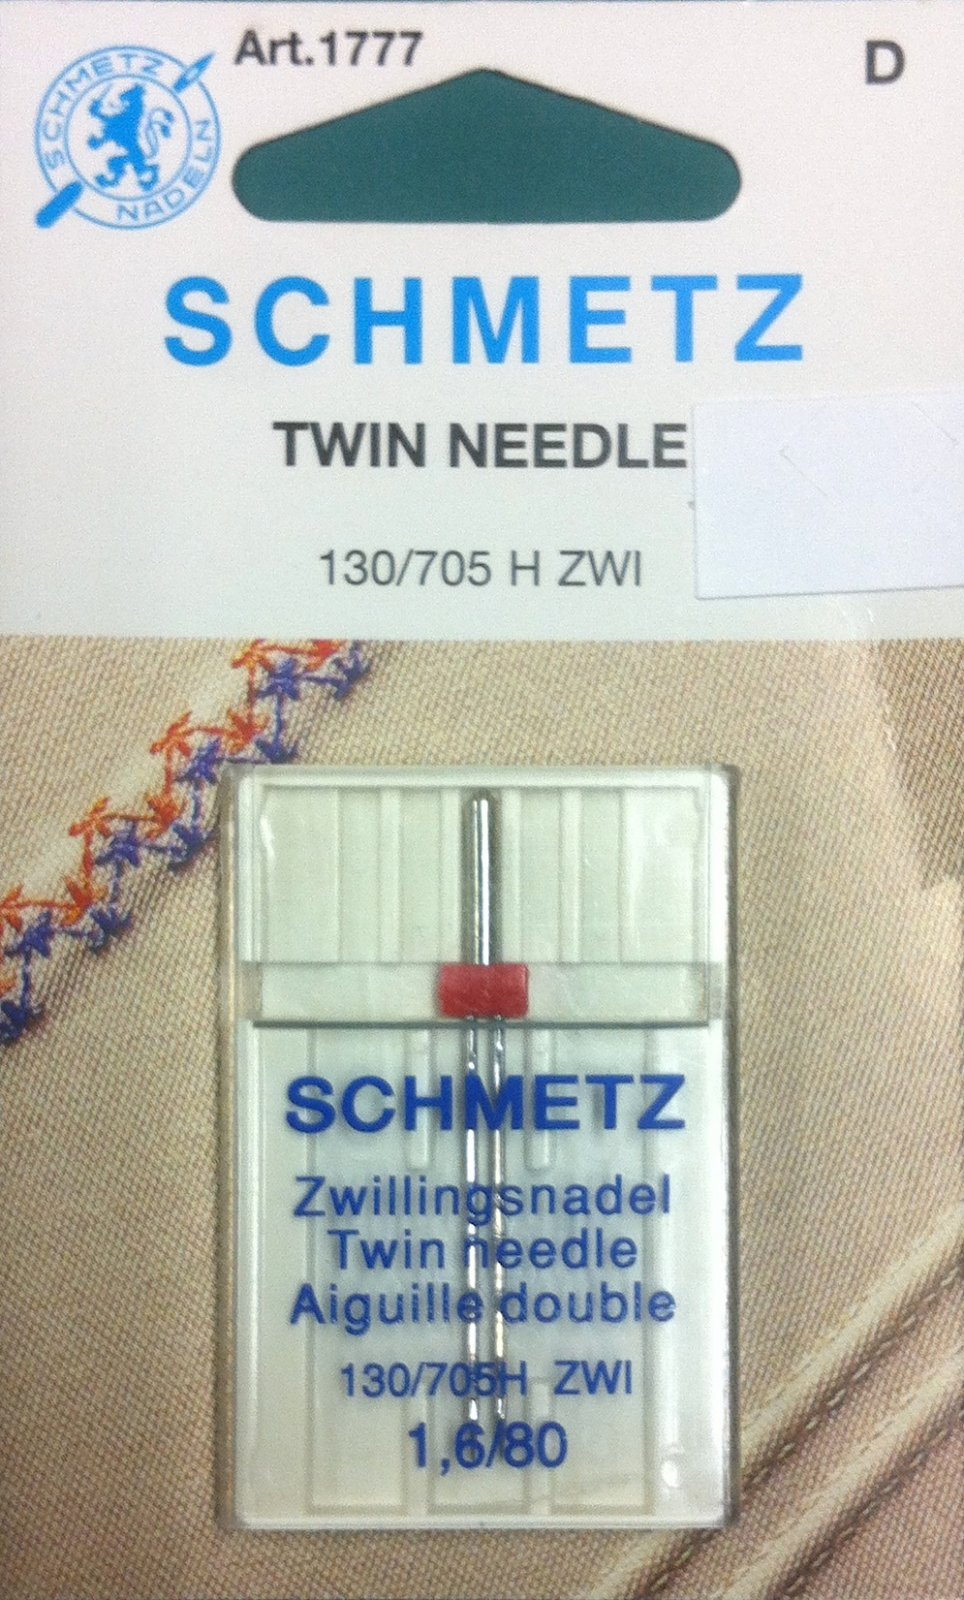 Schmetz Twin Needle 1.6/80